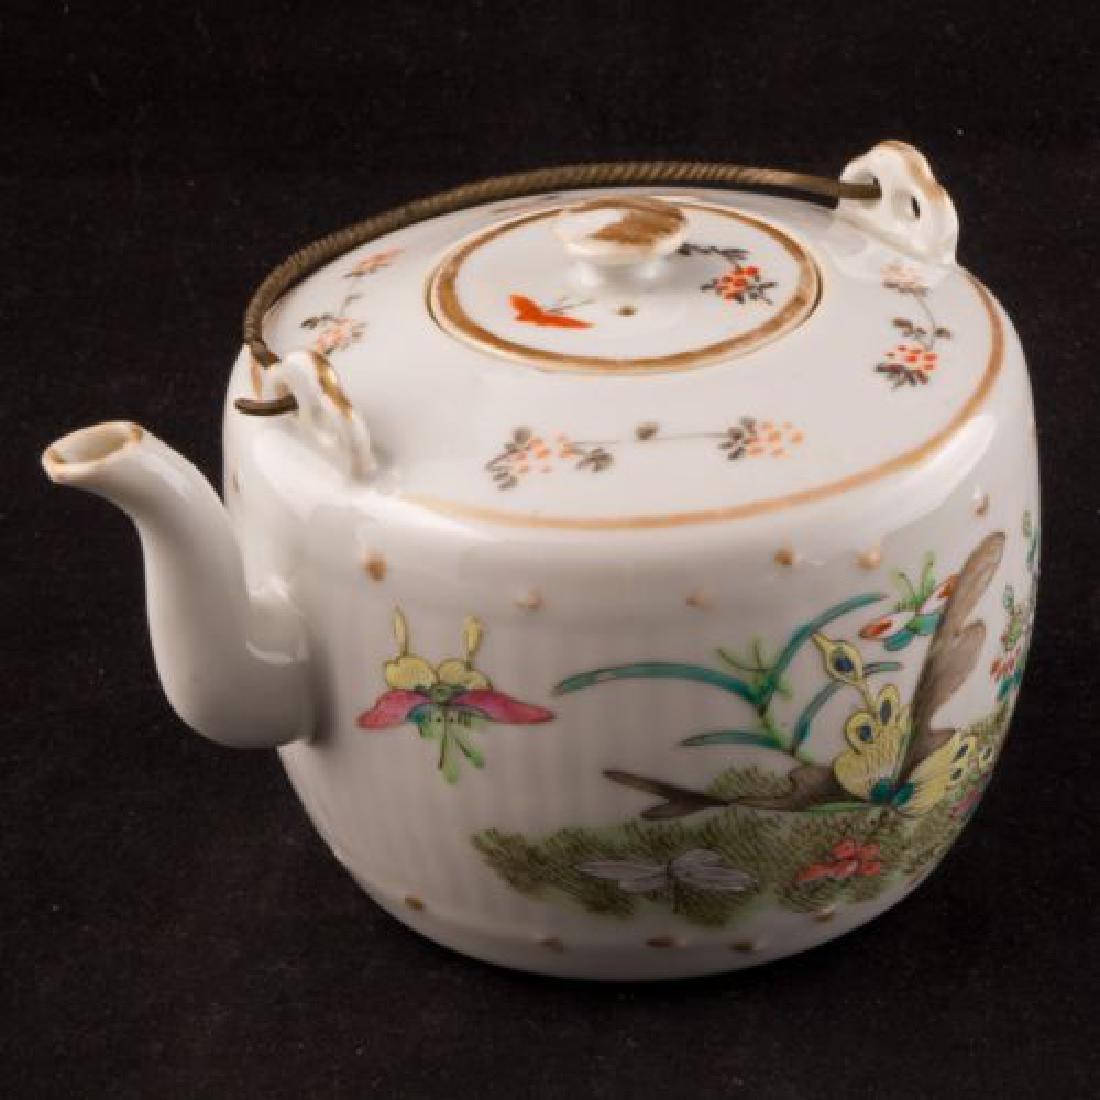 Chinese overglaze enamel and transfer porcelain teapot